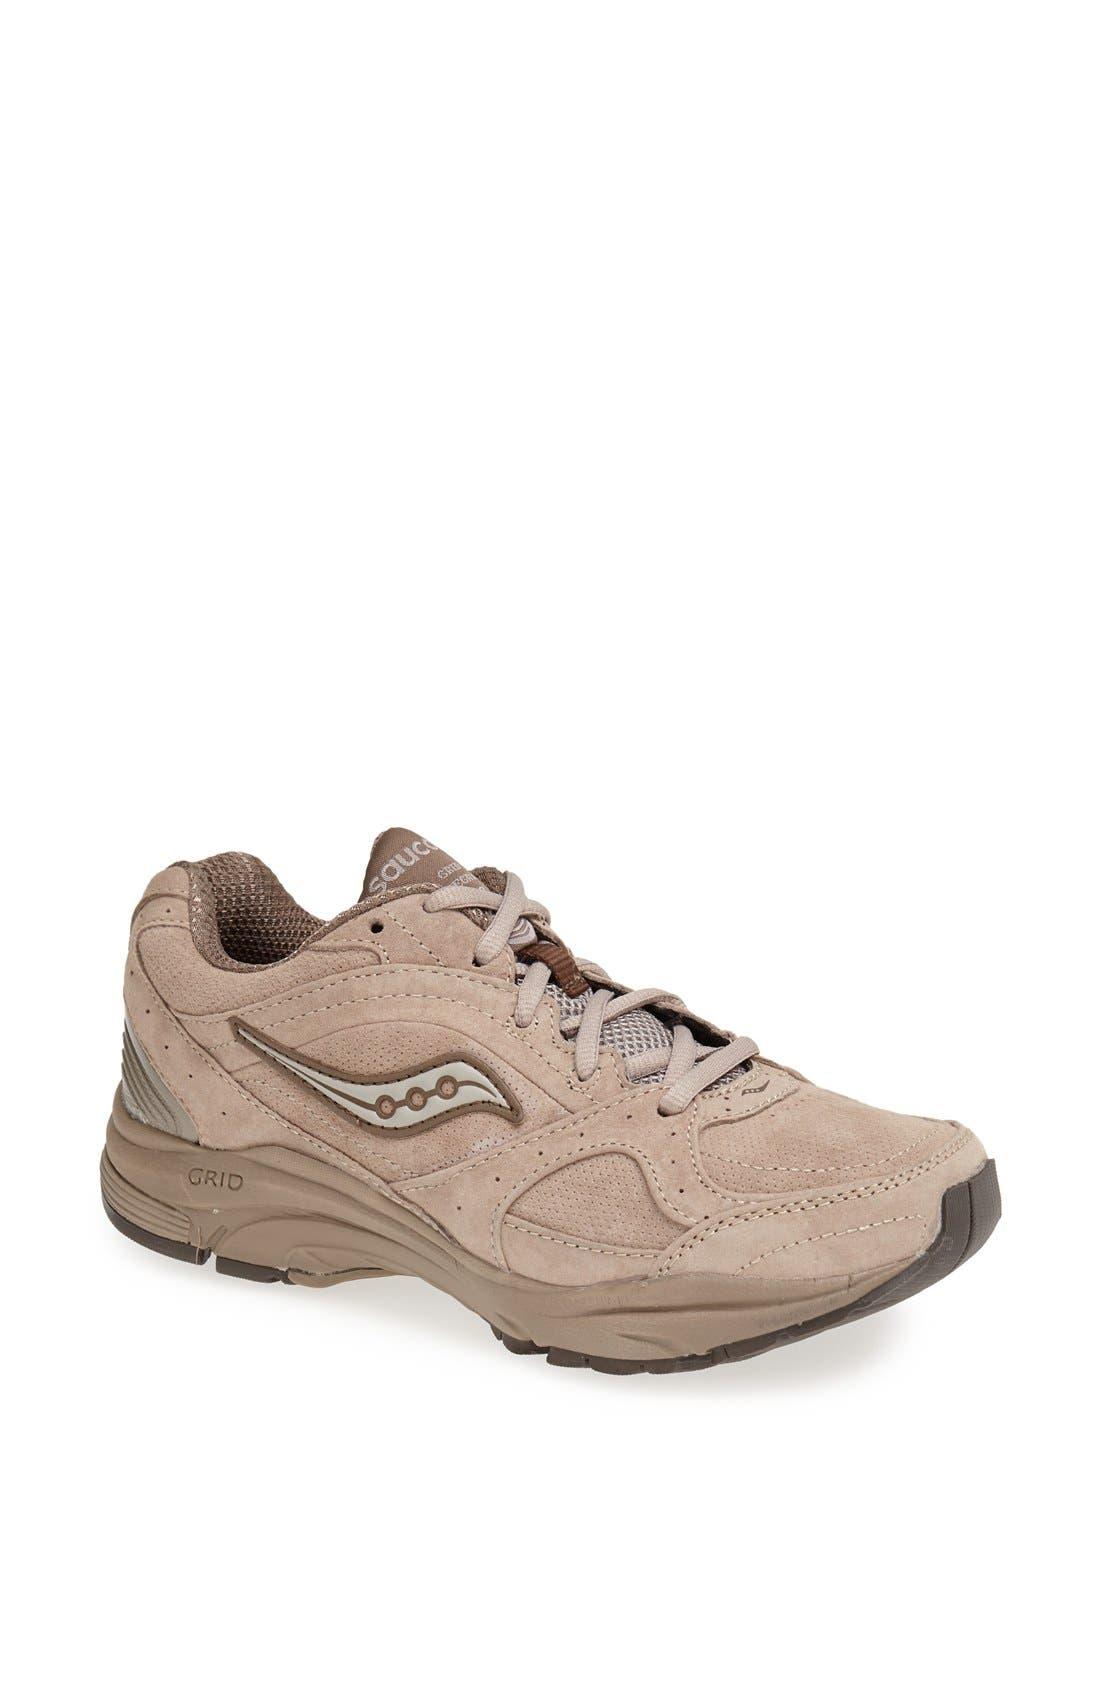 Alternate Image 1 Selected - Saucony 'Integrity ST2' Running Shoe (Women)